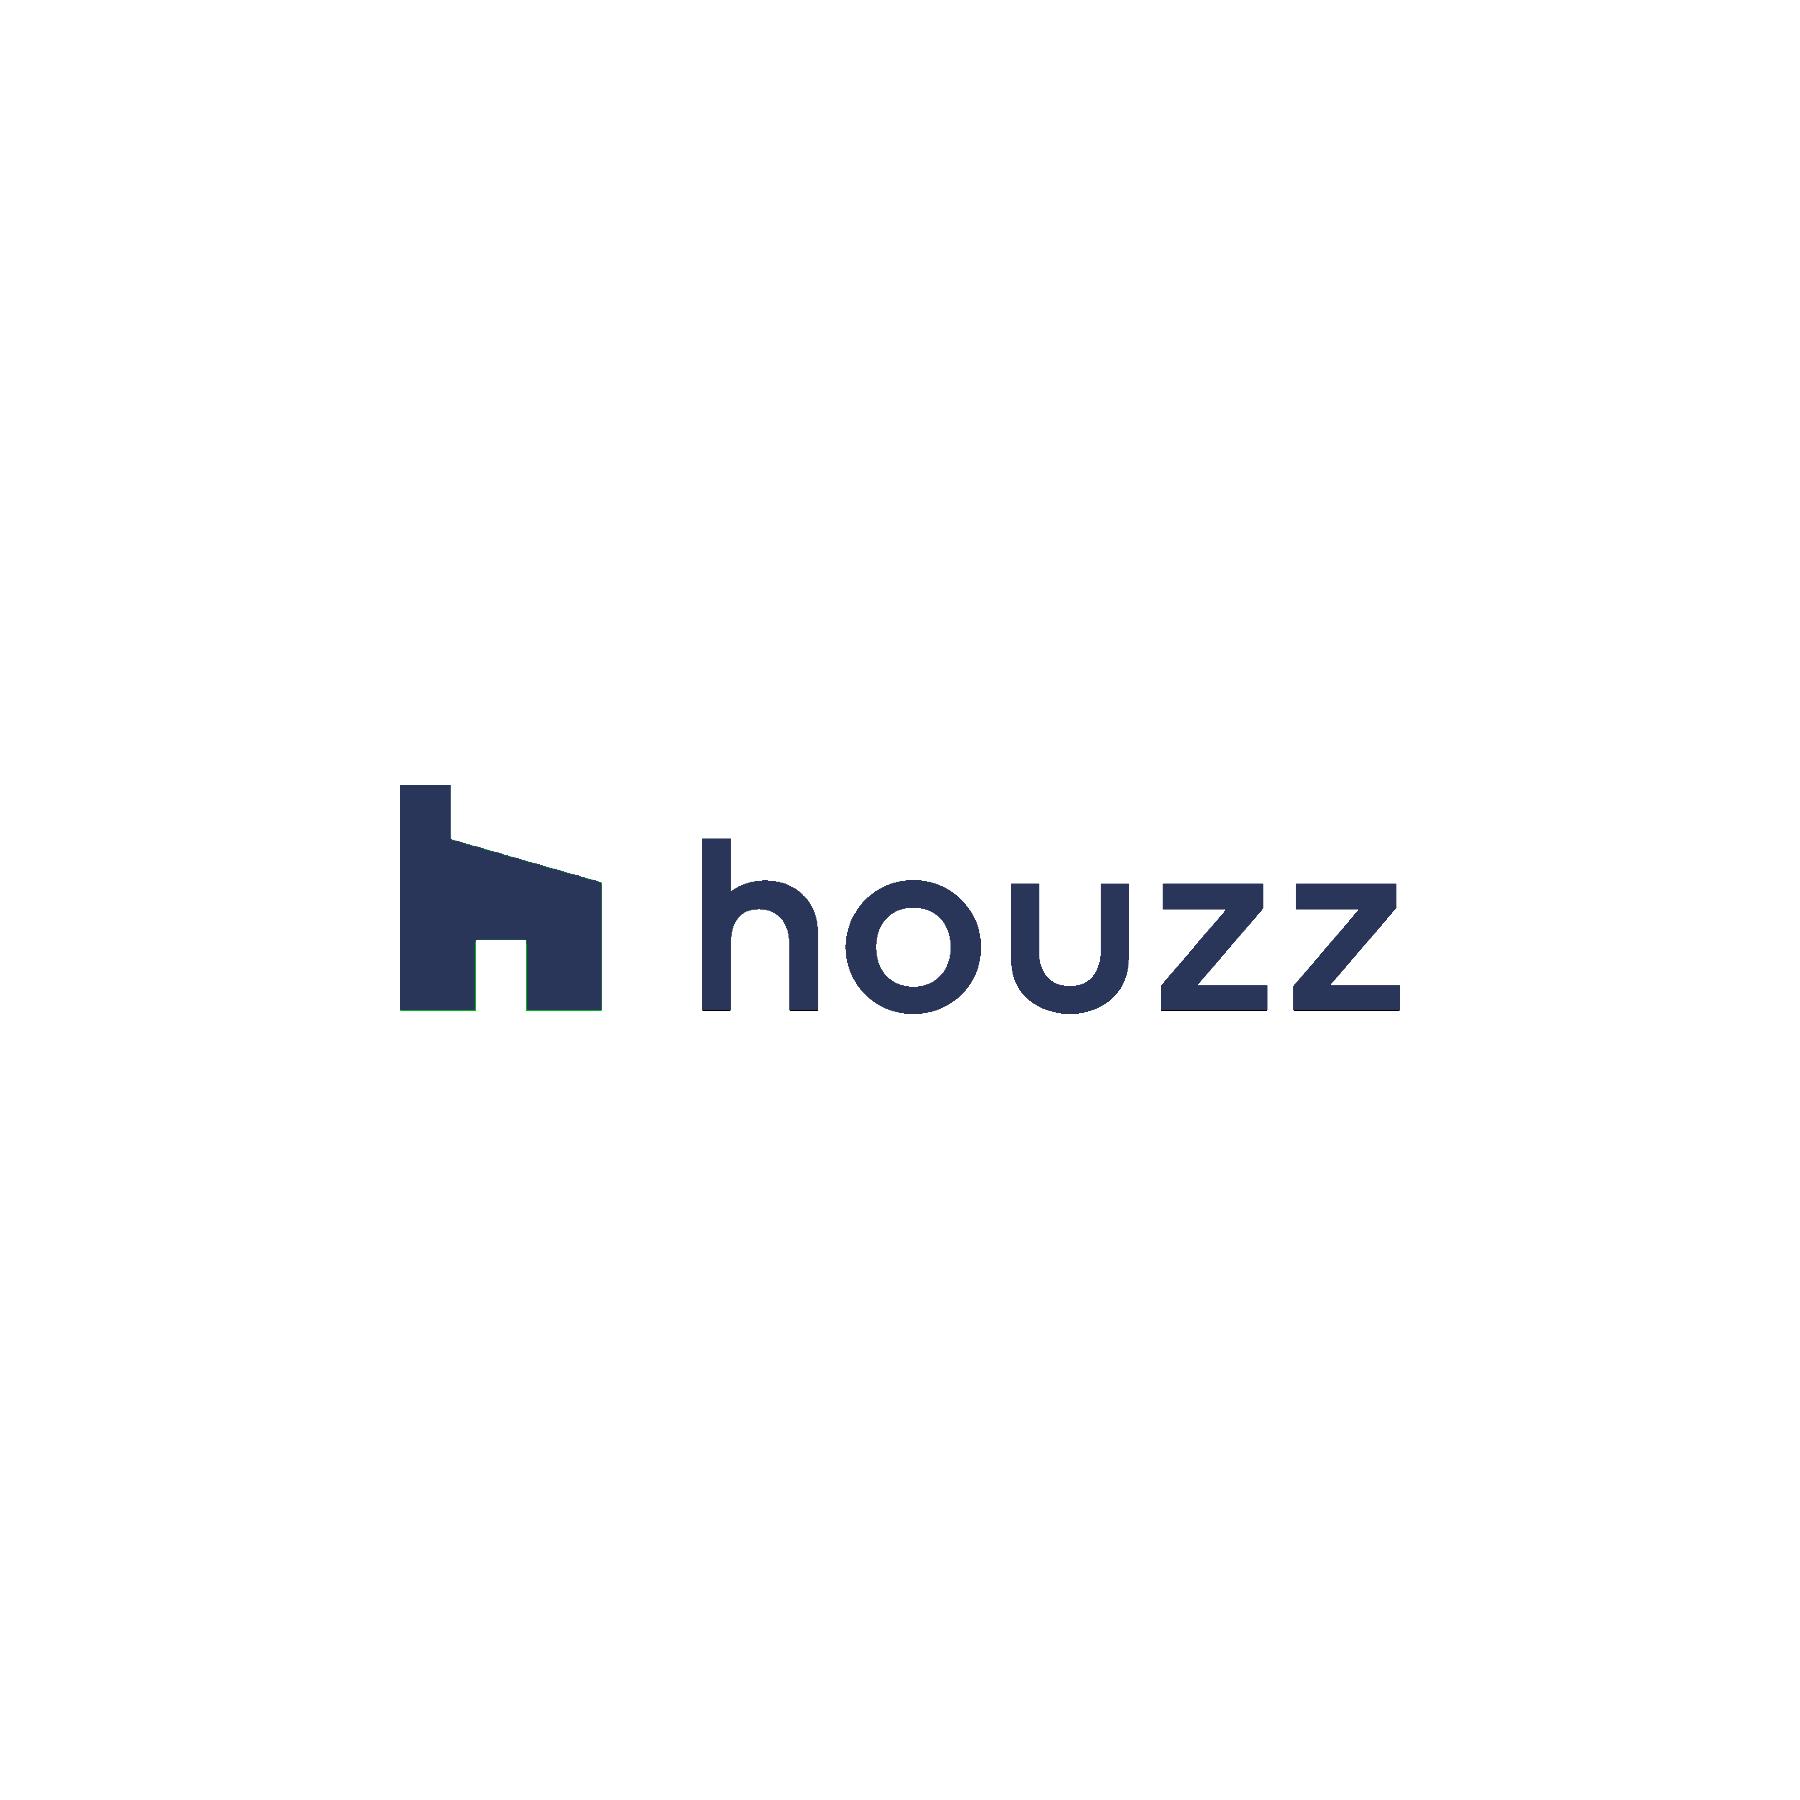 Houzz logo - Landed blue